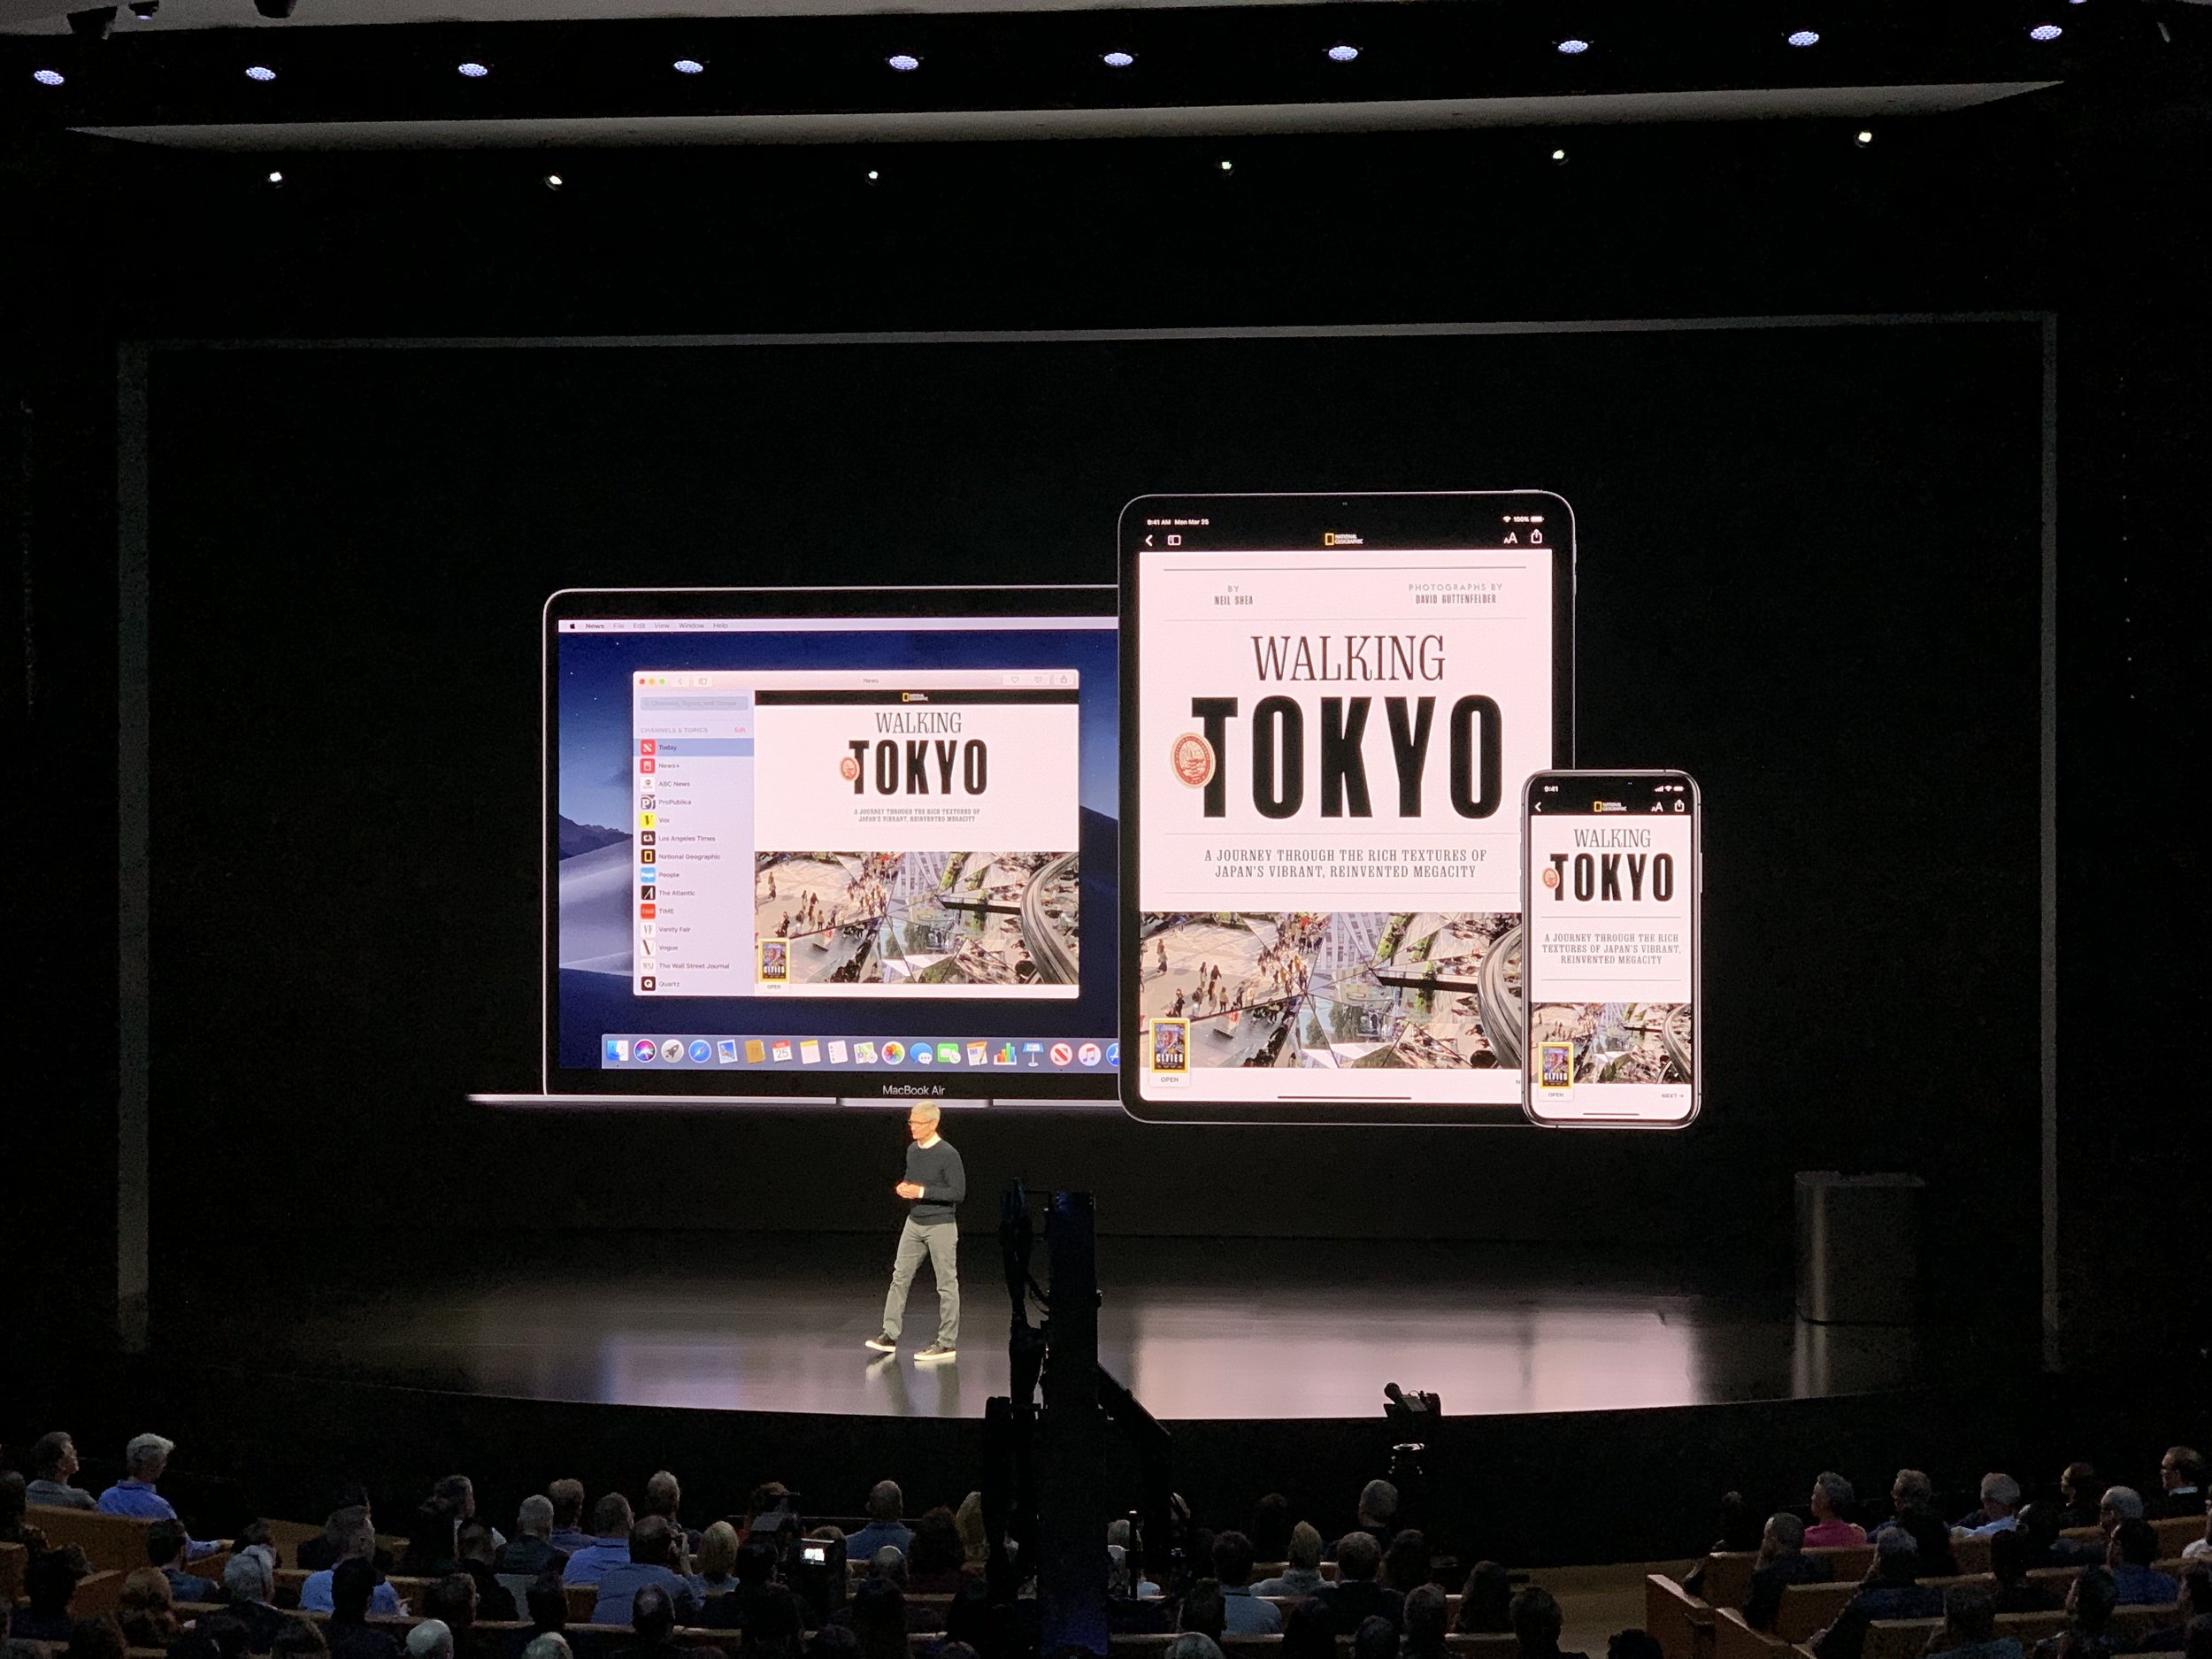 Wall Street Journal's polarizing Jony Ive story scoffed at by Apple